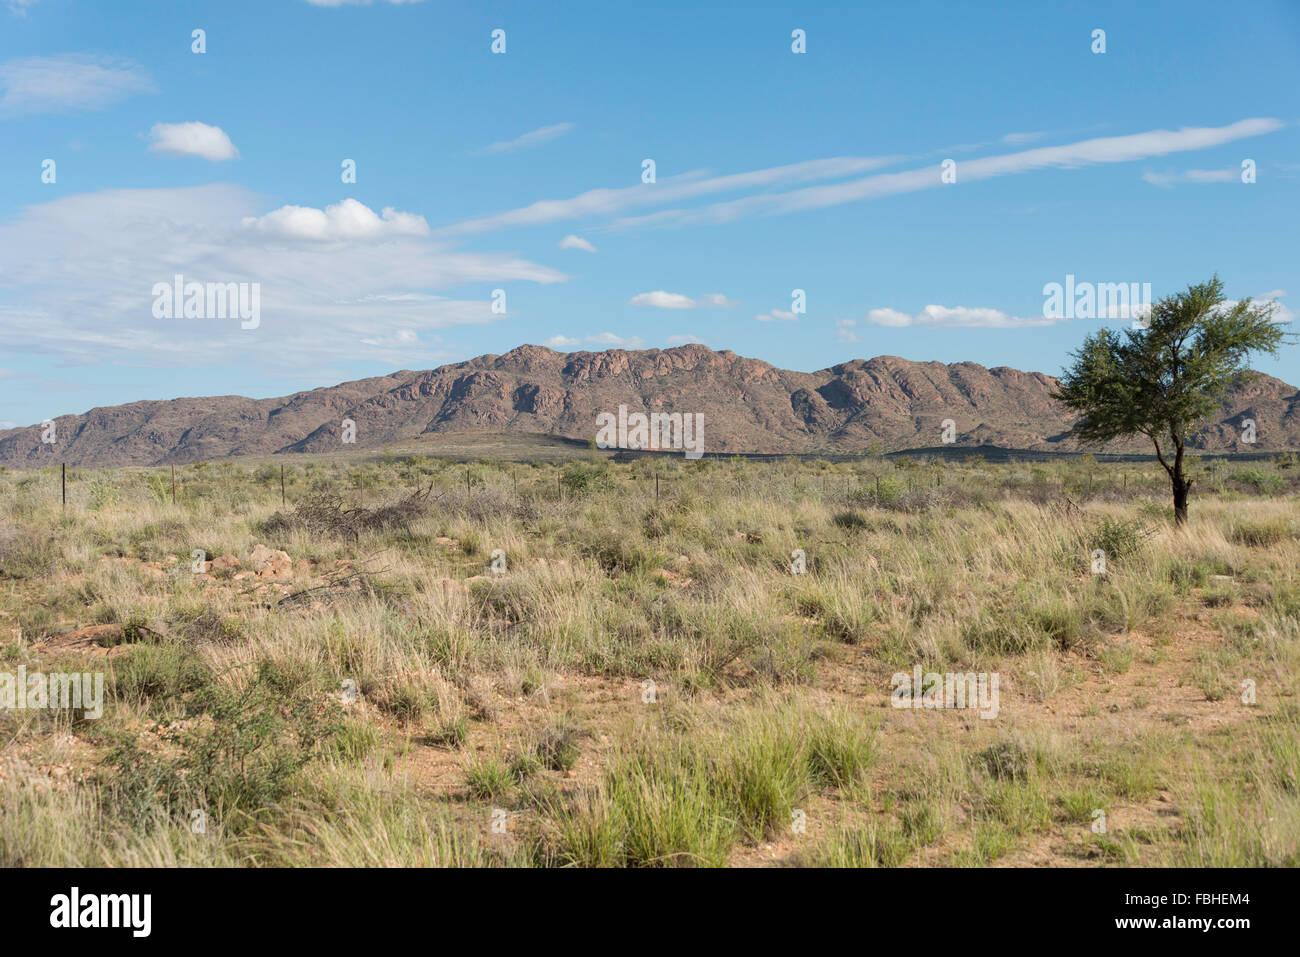 Namib Naukluft Park, Solitaire, Namib Desert, Republic of Namibia - Stock Image